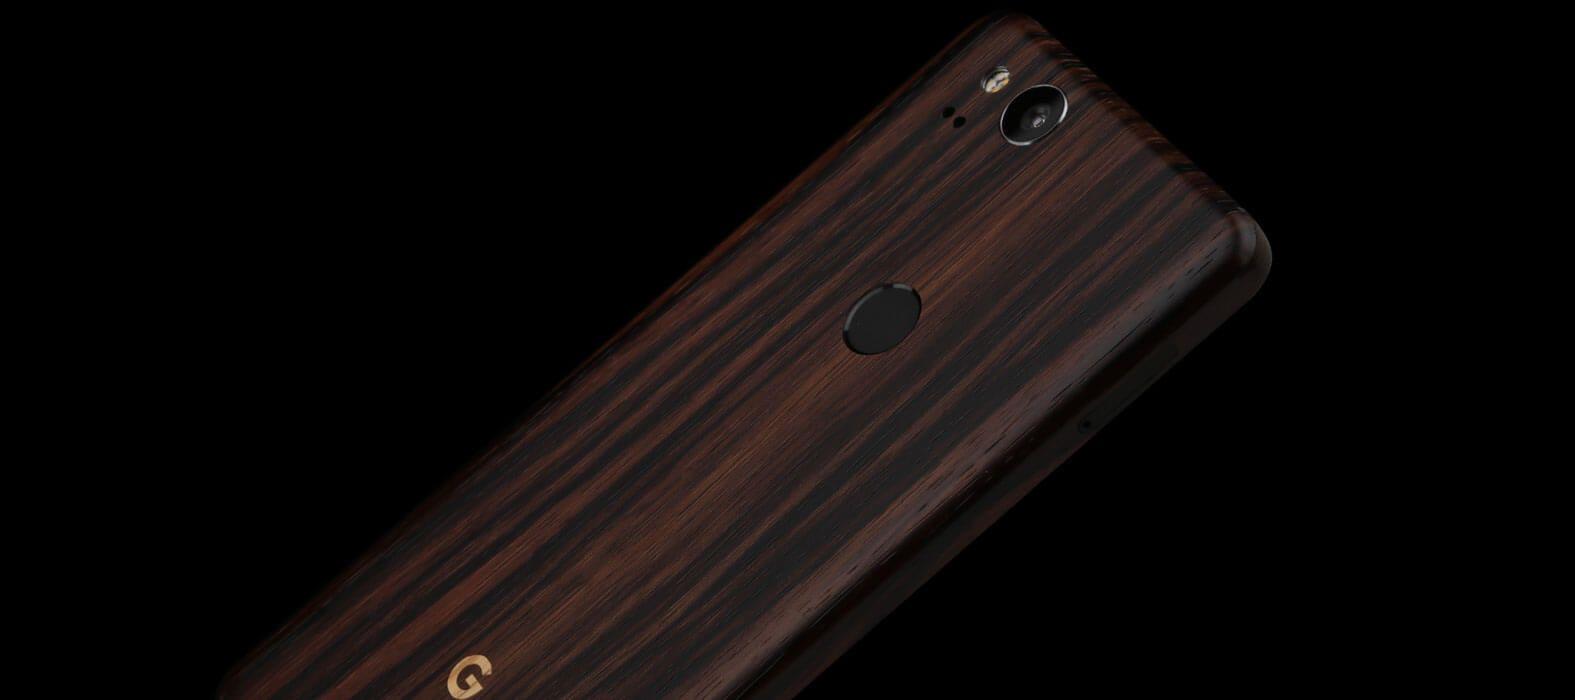 Pixel 2 Wraps, Skins, Decals - Ebony wood